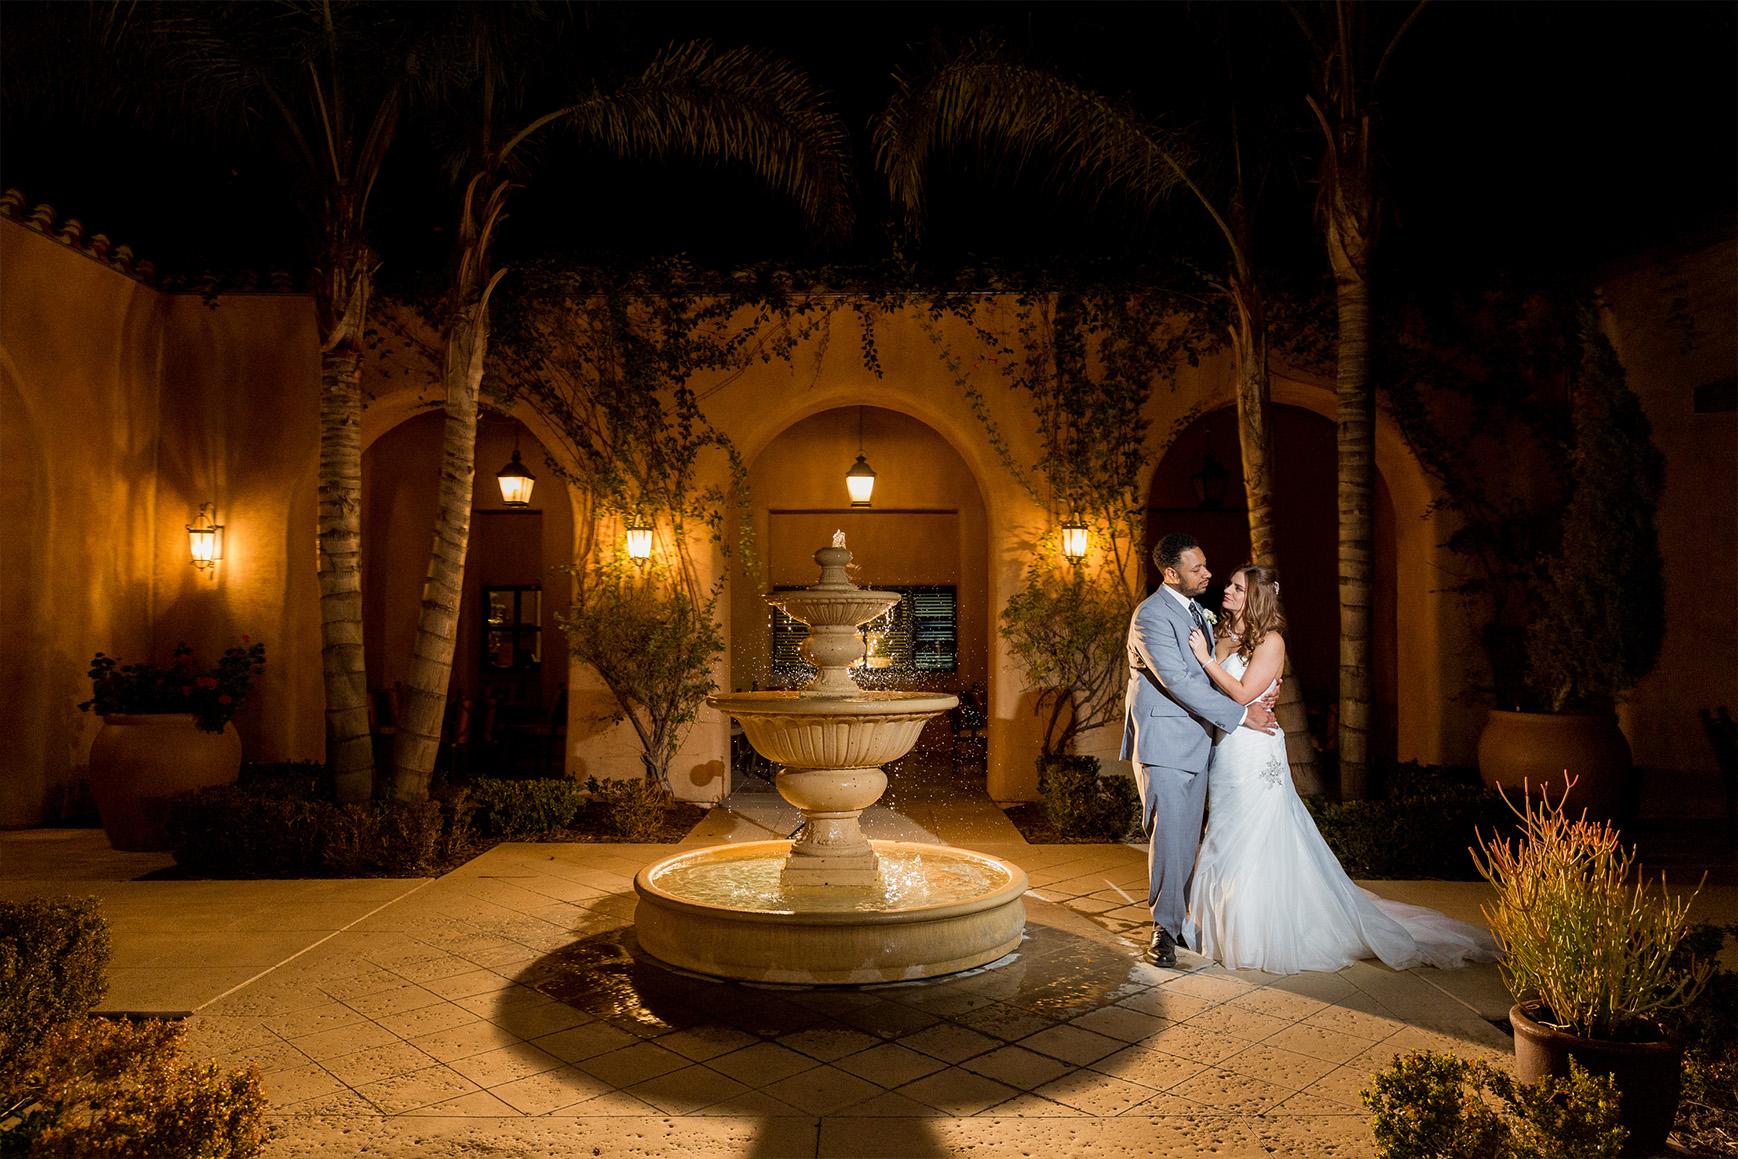 Fountain glow - The Retreat - Corona, California - Riverside County - Wedgewood Weddings